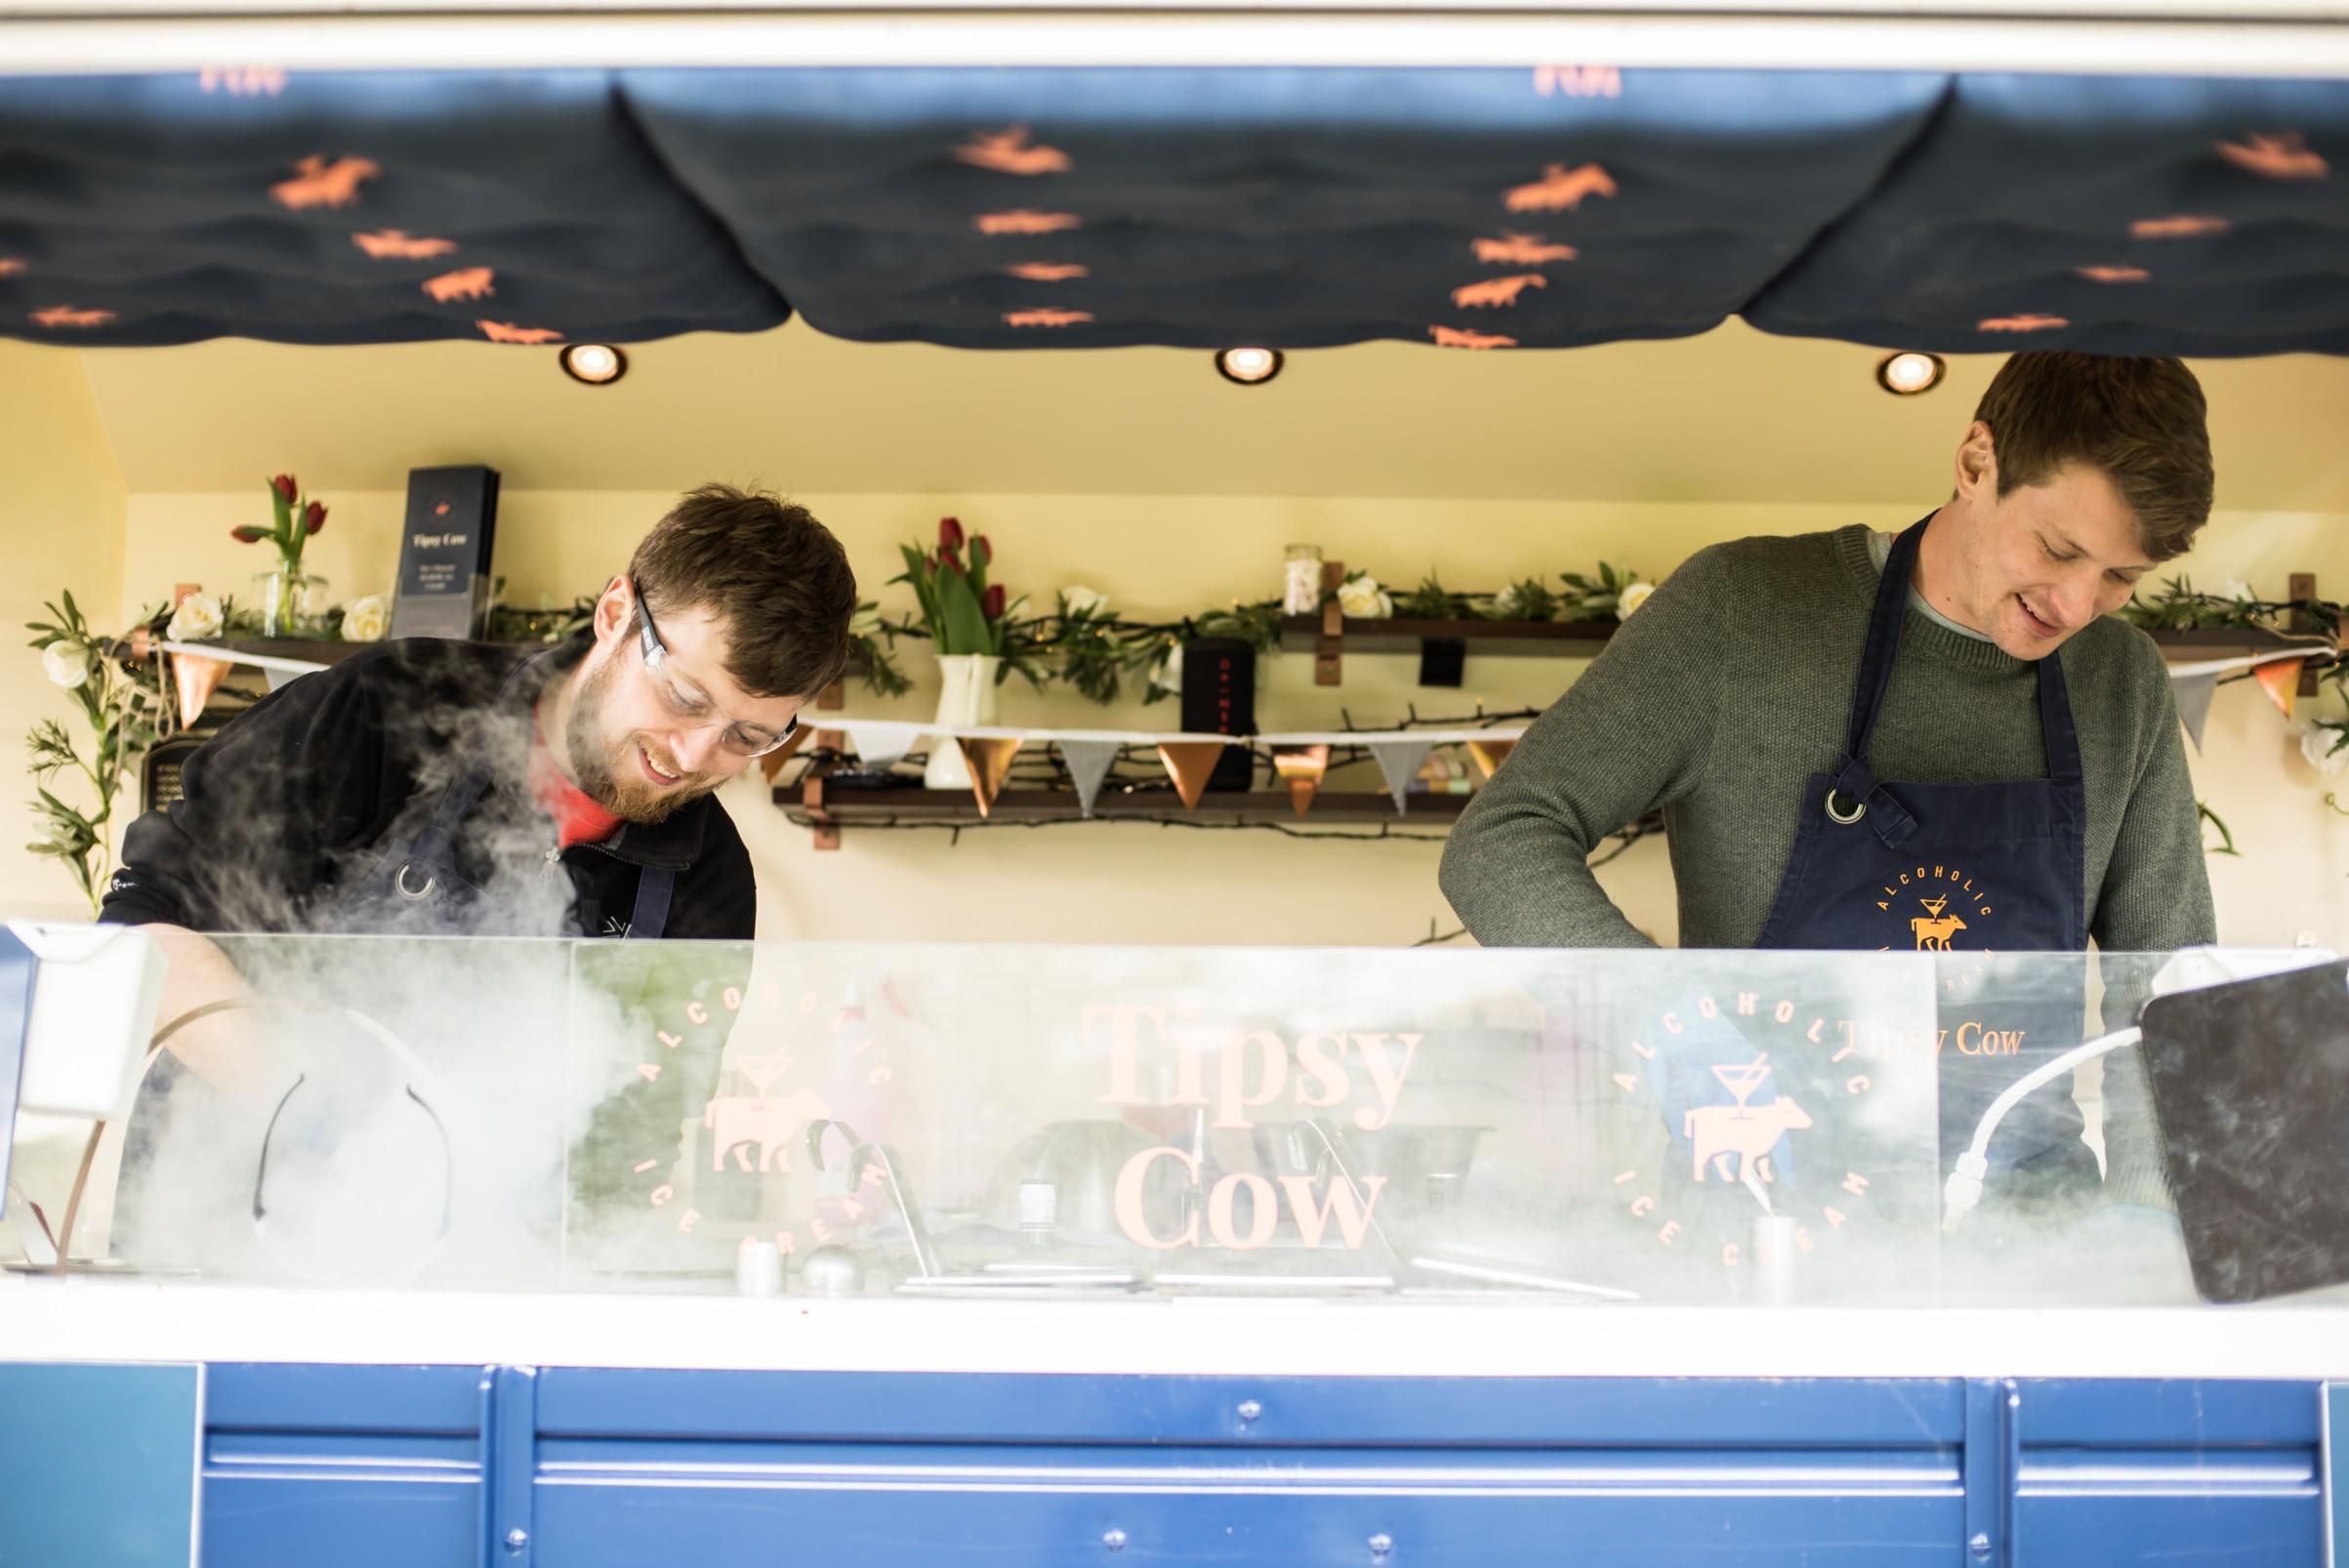 Tipsy cow ice cream - how to plan a festival wedding - unconventional wedding festival - alternative wedding food trucks - matt glover photog